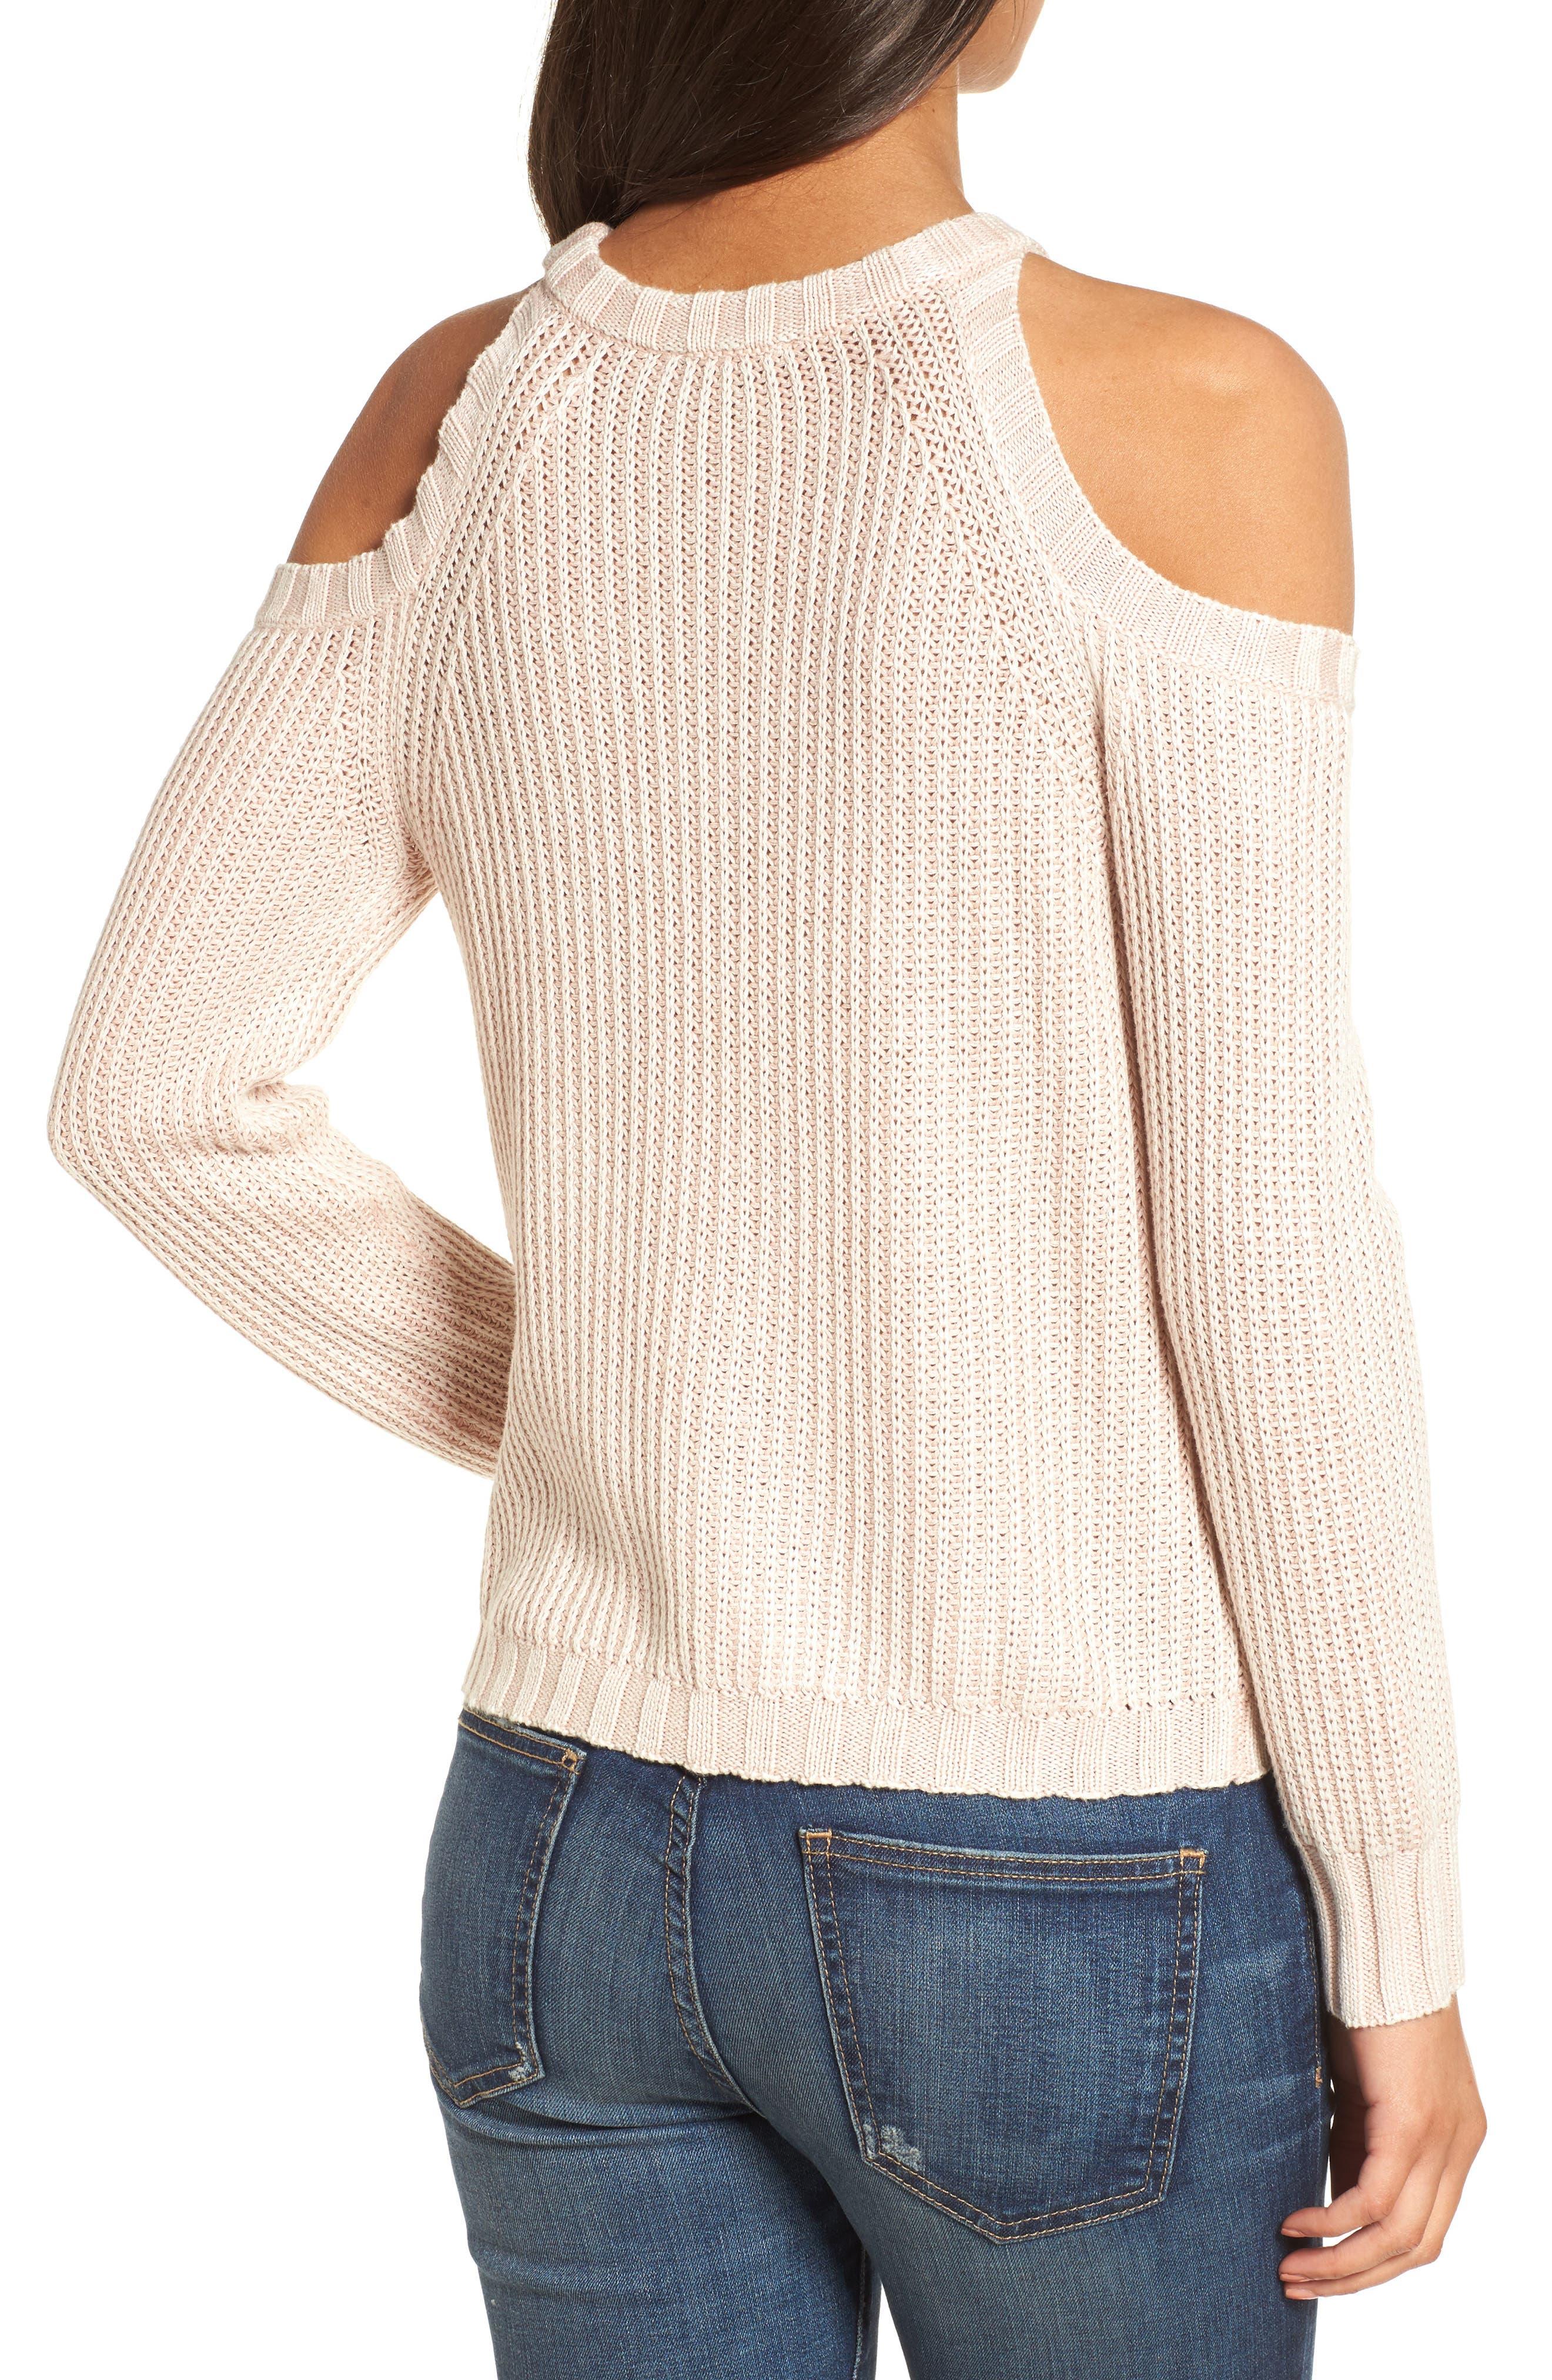 Mika Cold Shoulder Sweater,                             Alternate thumbnail 2, color,                             681